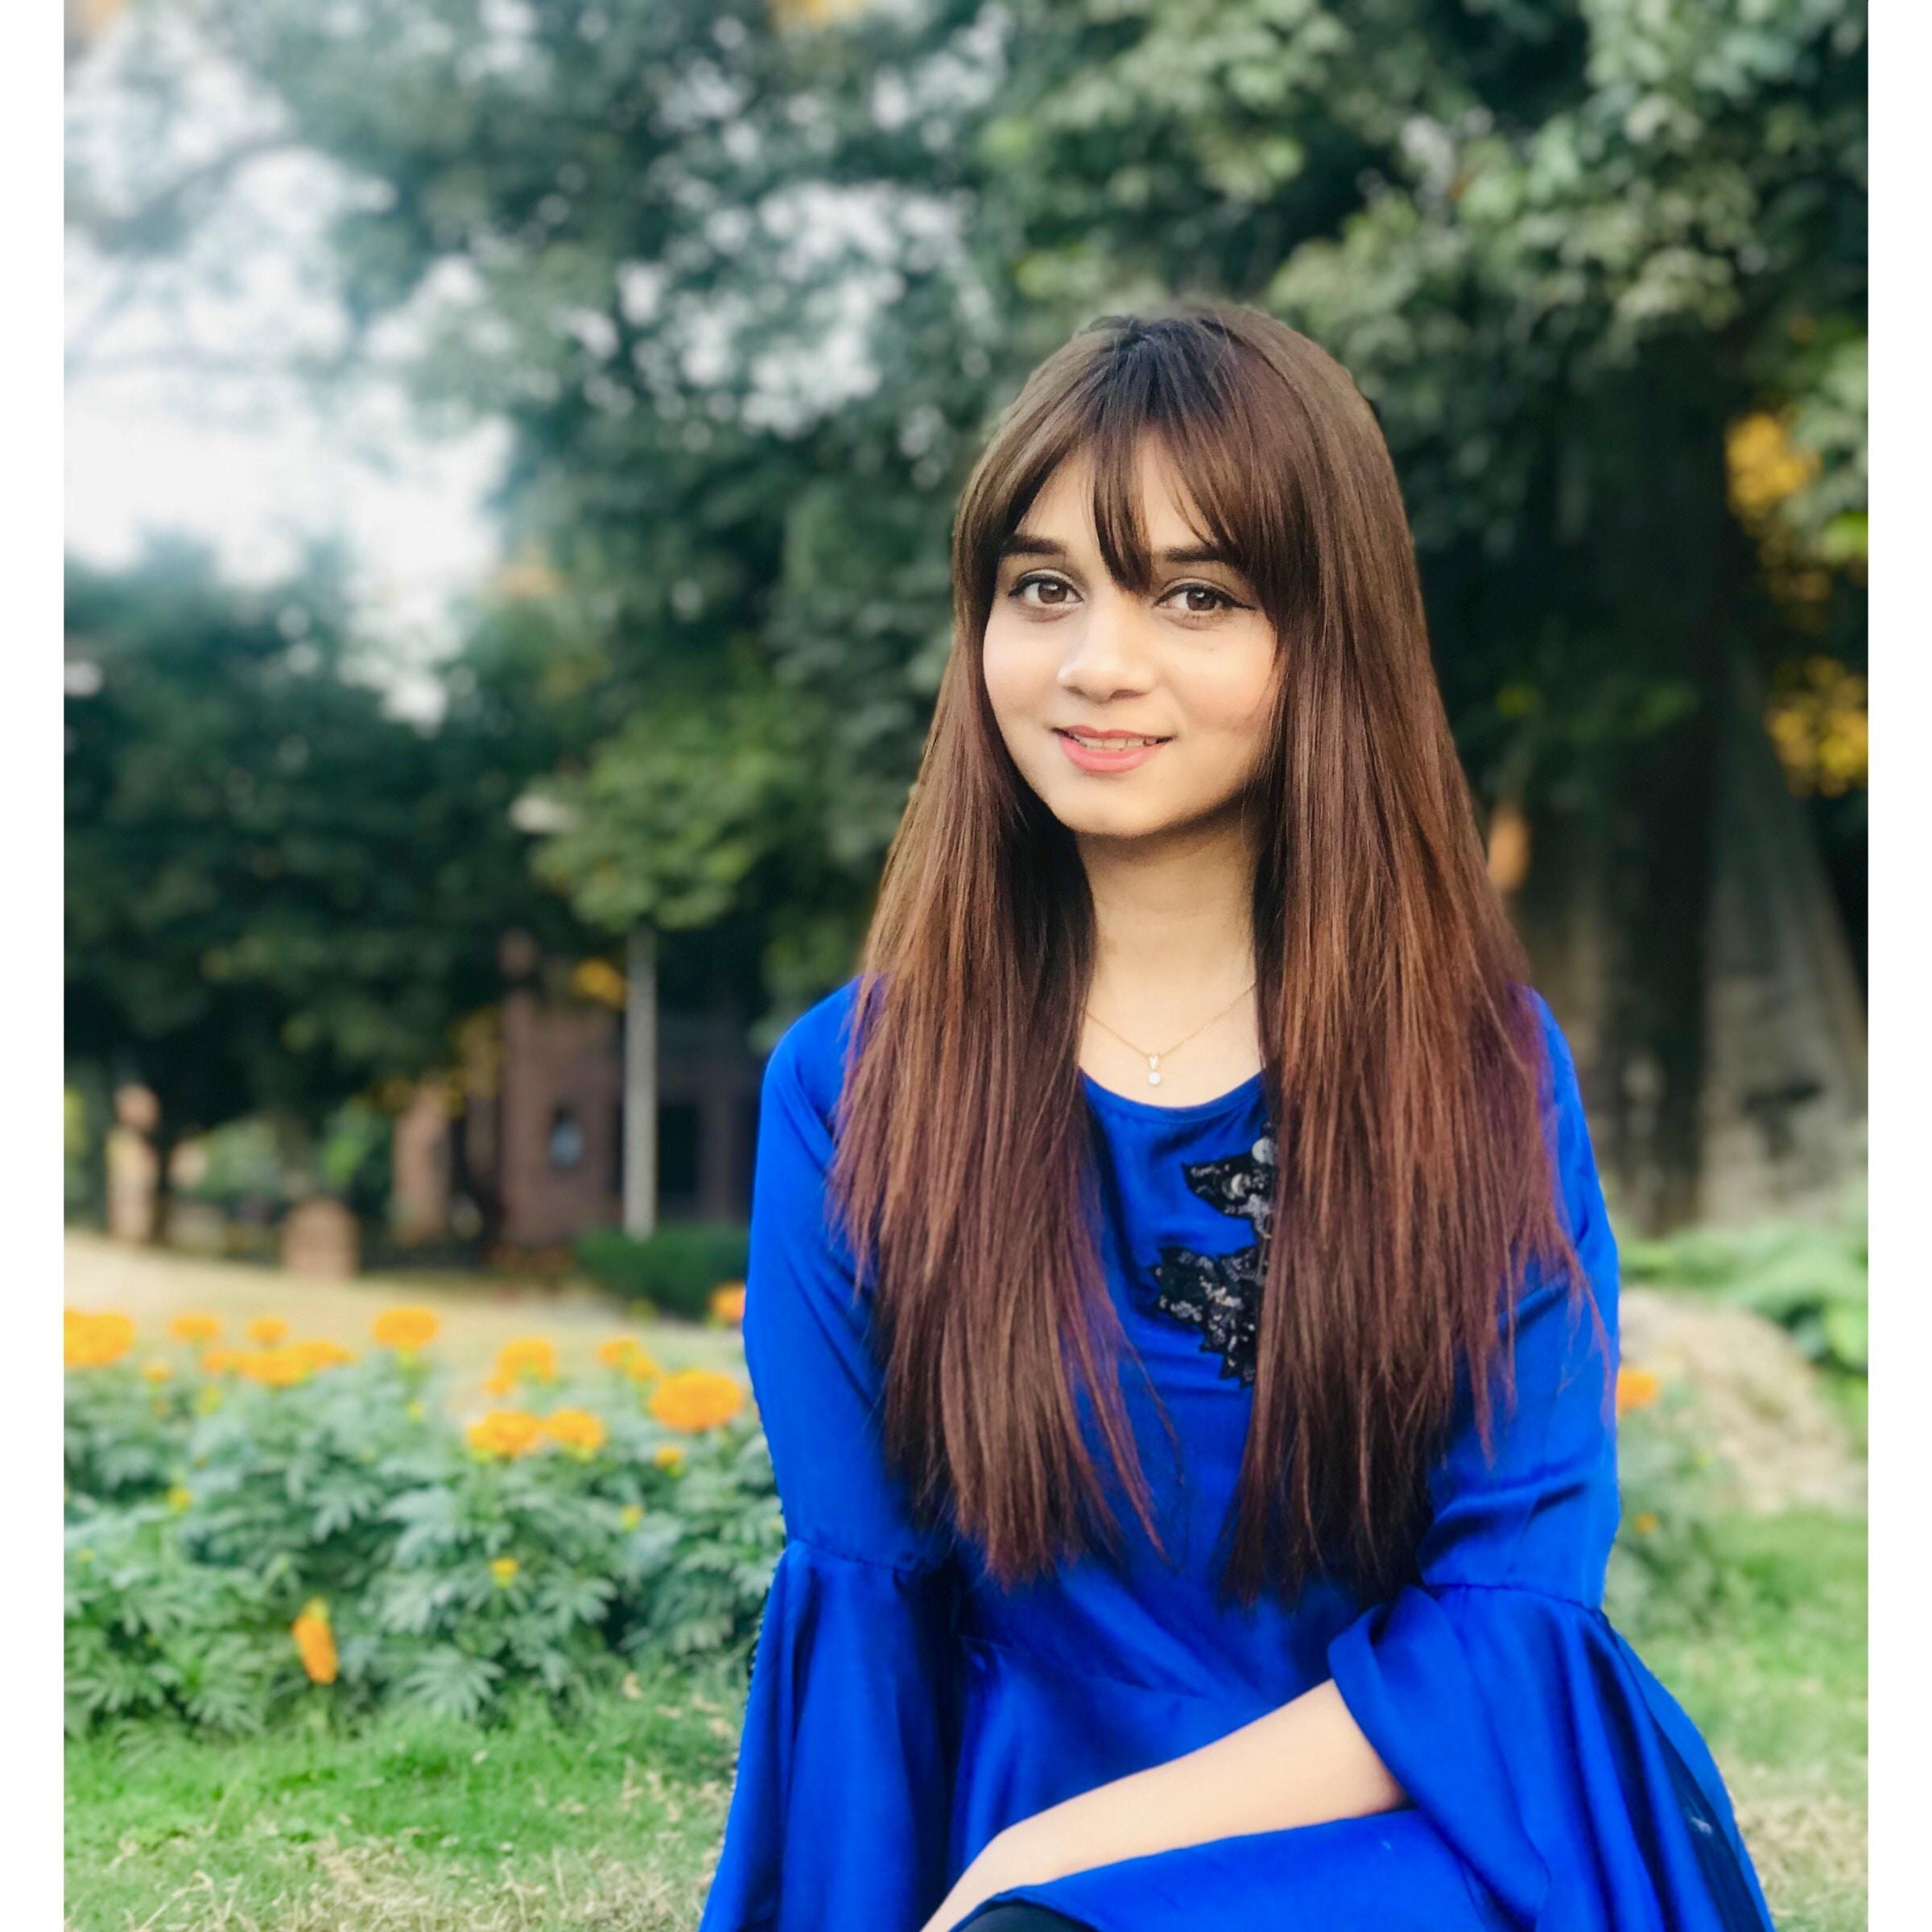 Go to Hena Sheikh's profile